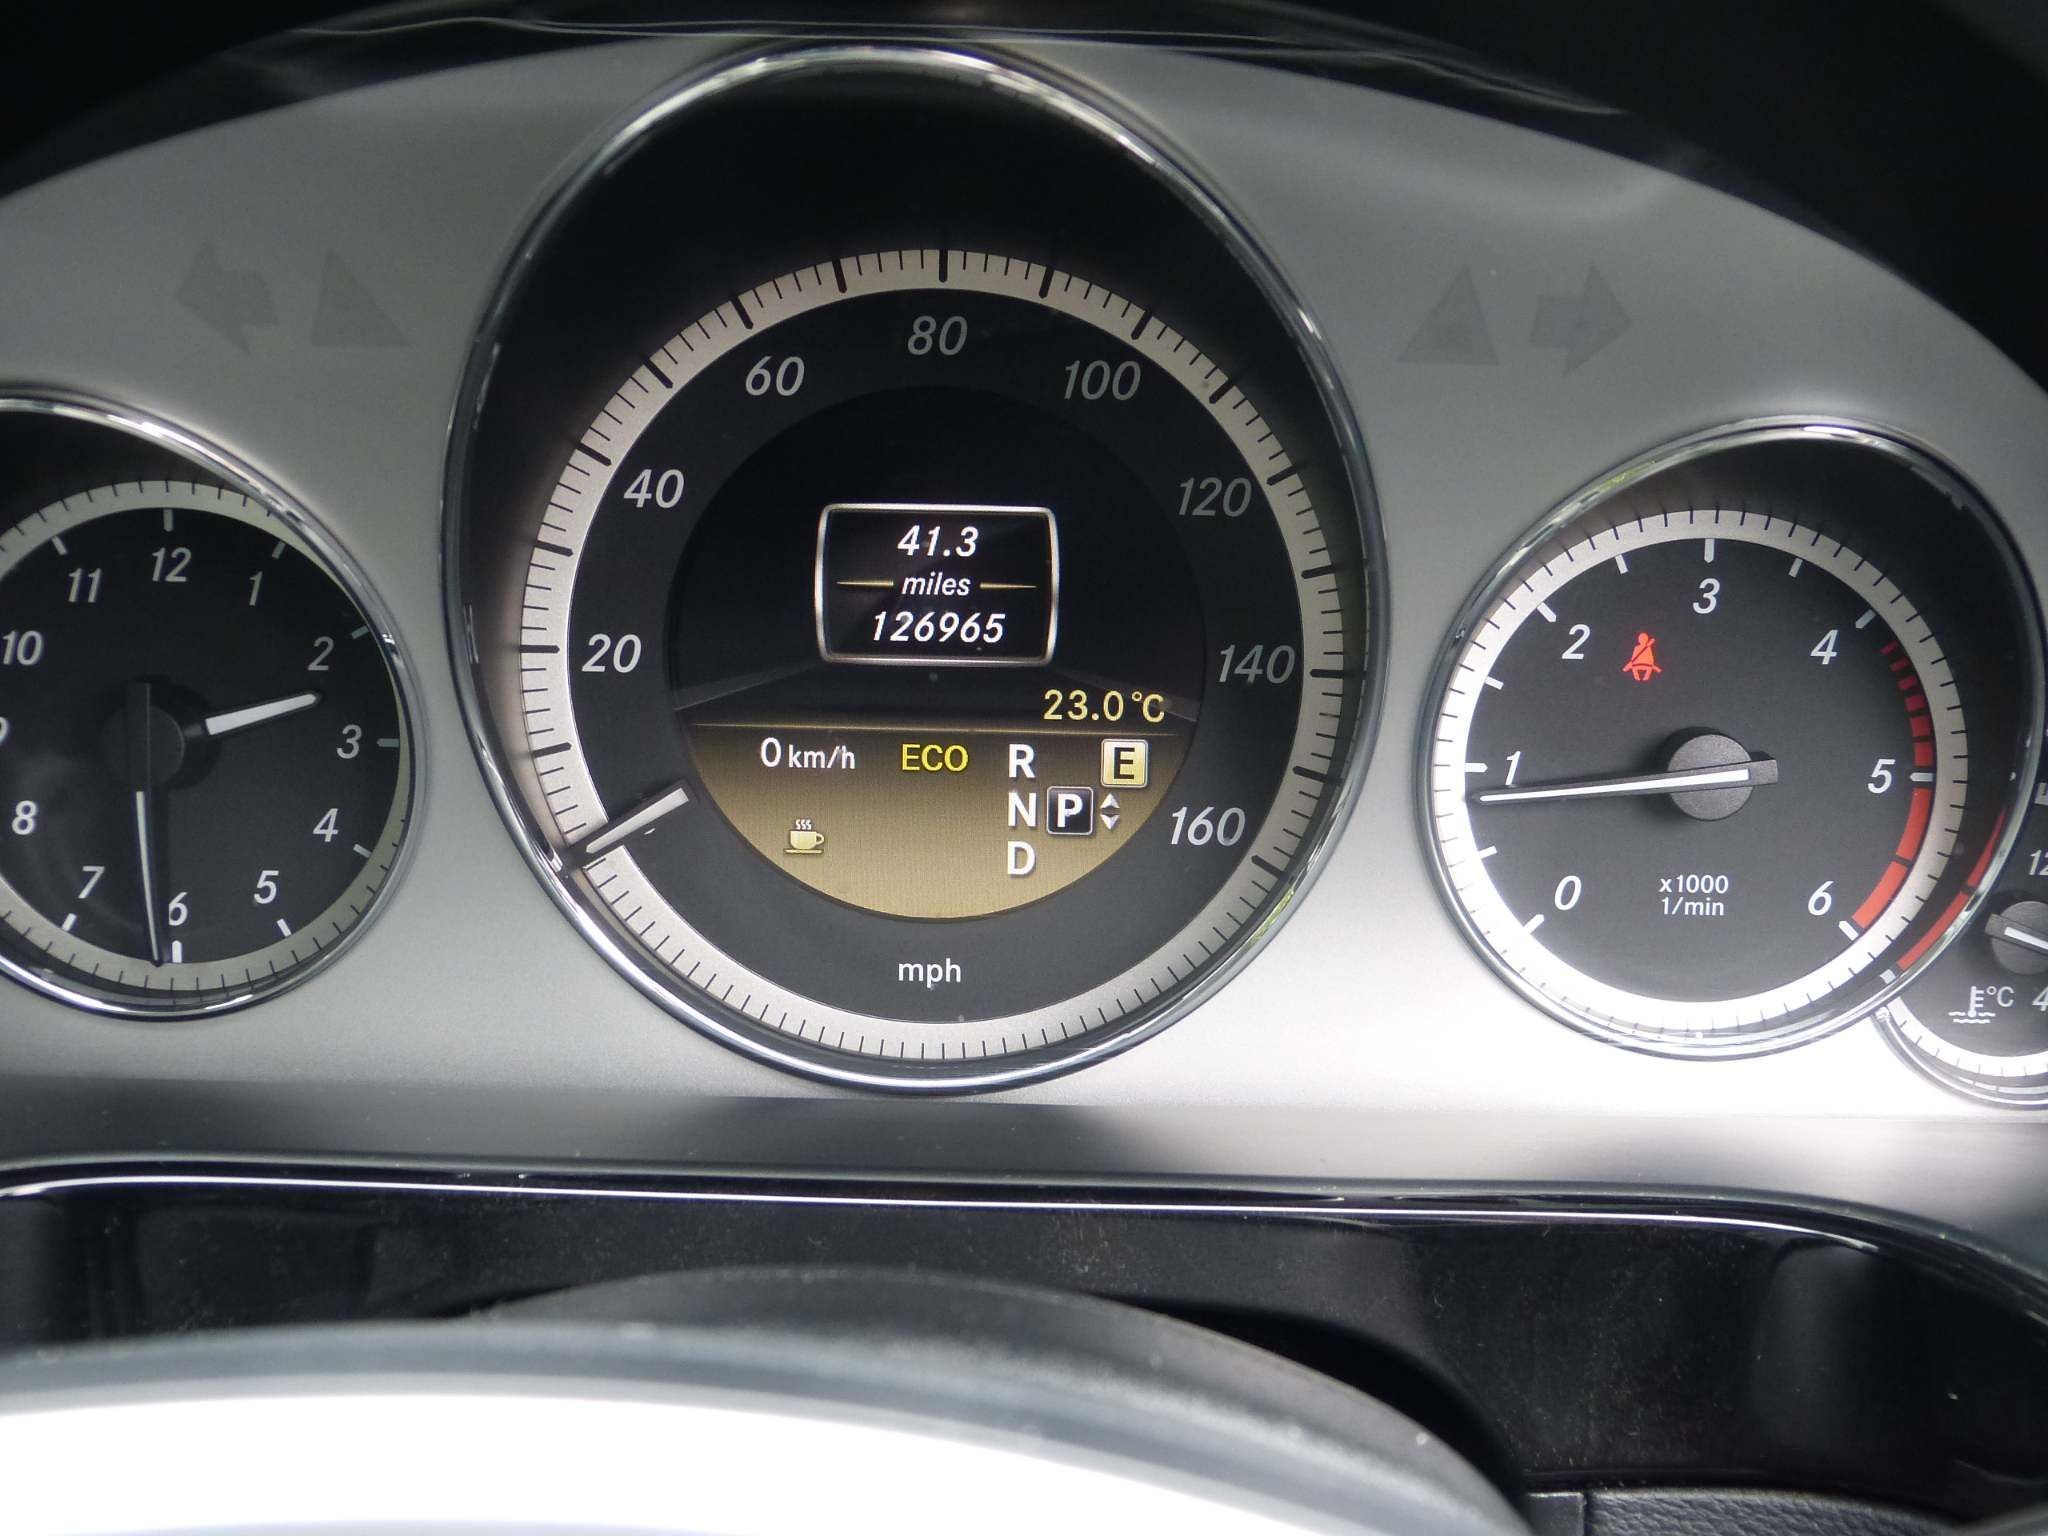 2012 MERCEDES BENZ E Class 2.1 E220 CDI BlueEFFICIENCY SE (Executive) G-Tronic Diesel Automatic  – Beechlawn Motors Belfast full